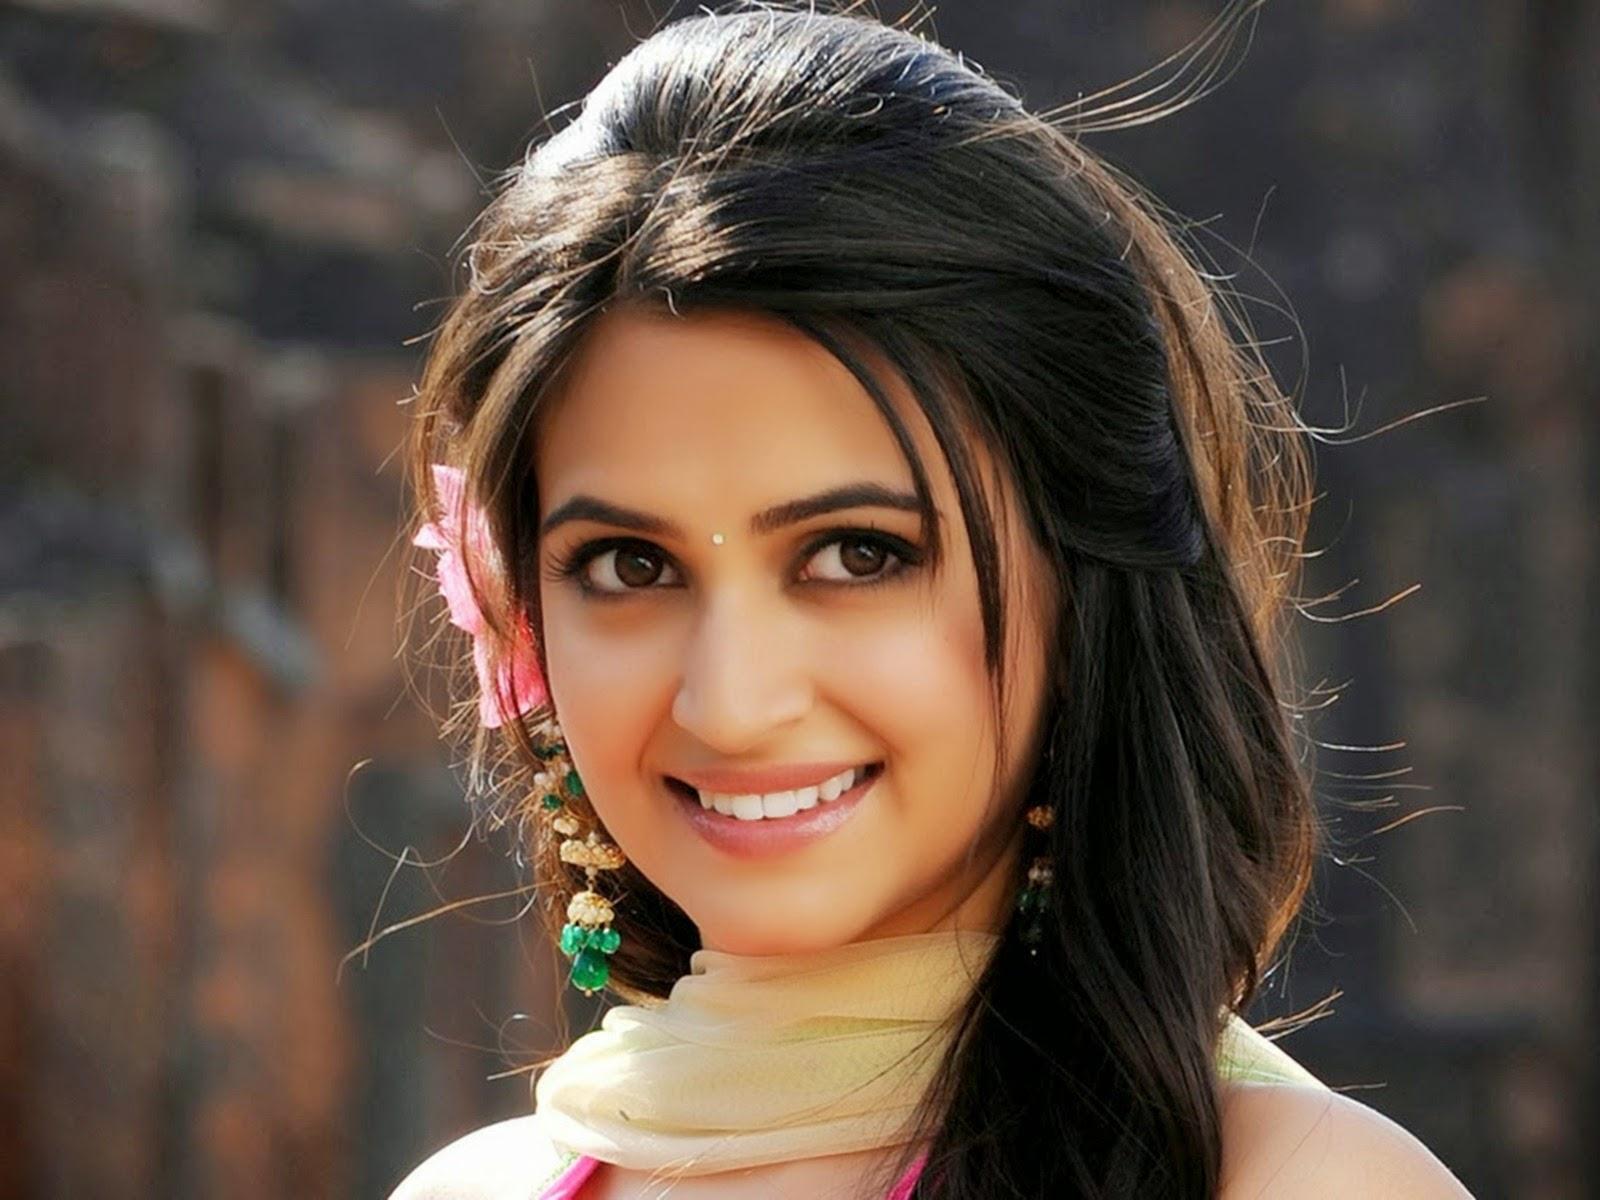 celebrities hd wallpaper download: kriti kharbanda hd wallpapers fee